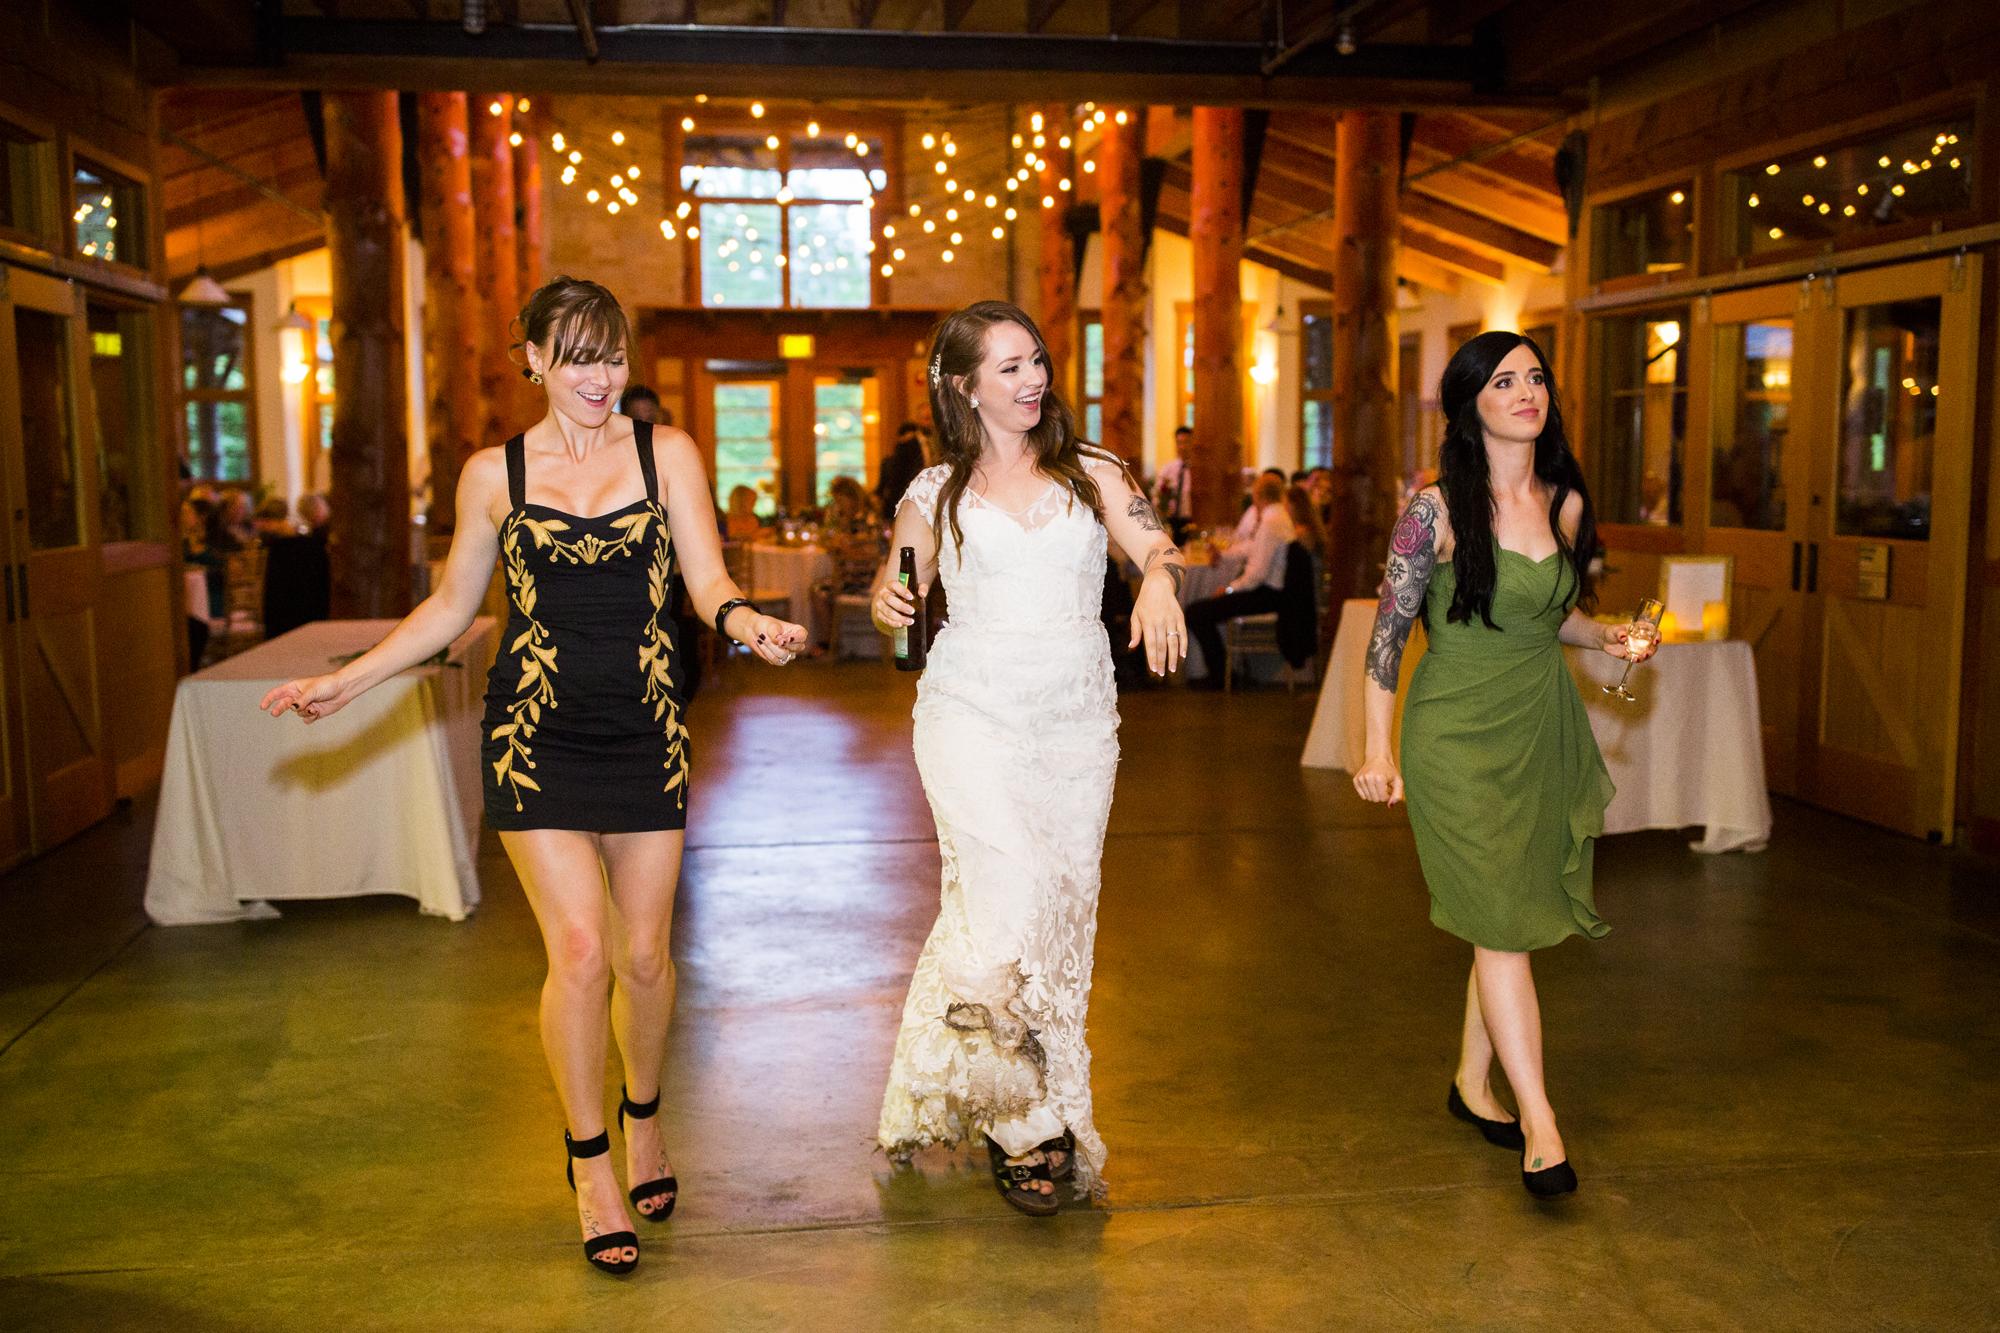 Seriously_Sabrina_Photography_Milwaukee_Wisconsin_Wedding_Schlitz_Audubon_Nature_Center_BrunderRife133.jpg